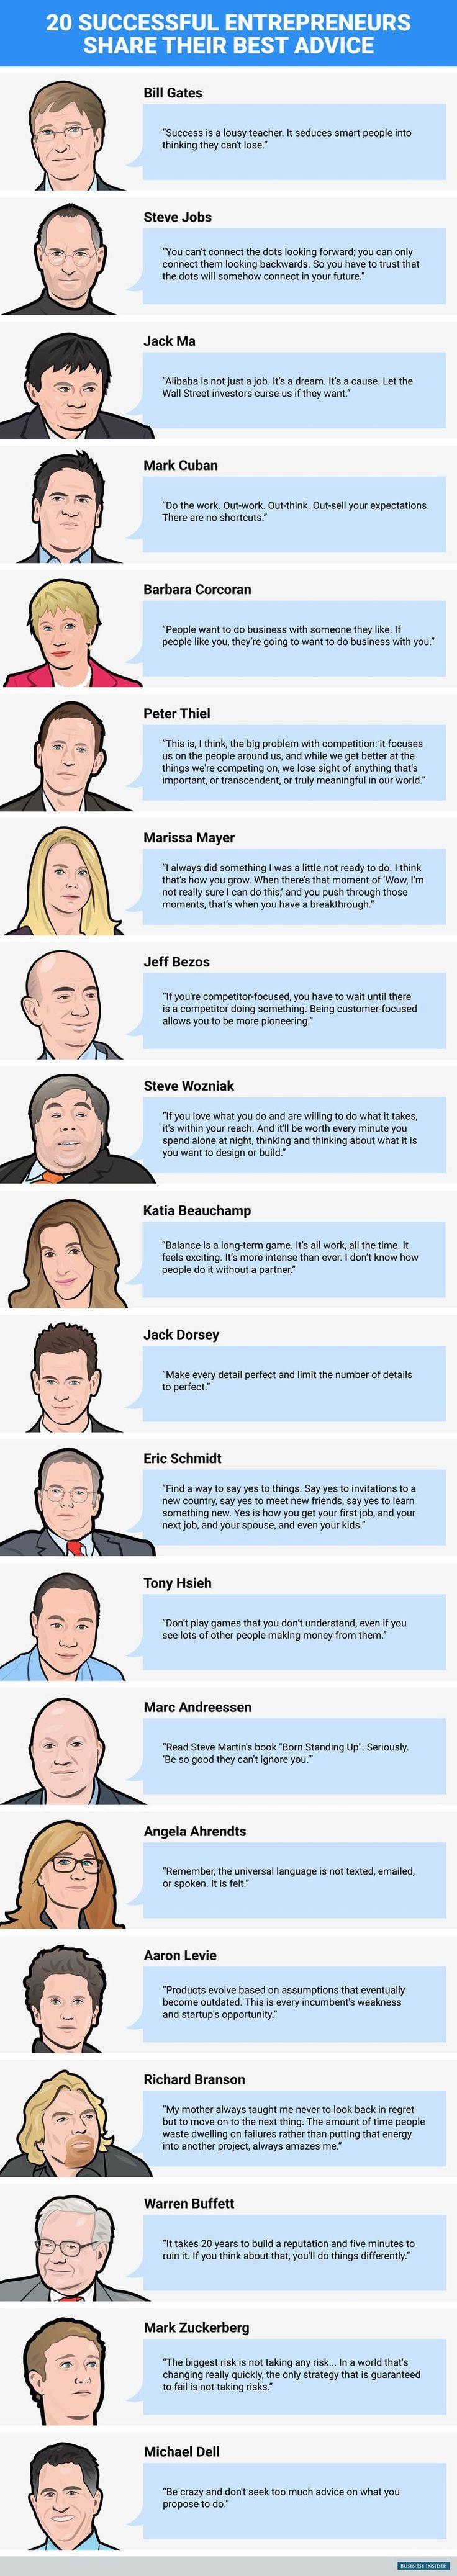 20 successful Entrepreneurs share their best advice [image] http://bit.ly/2mvUxoF #motivation